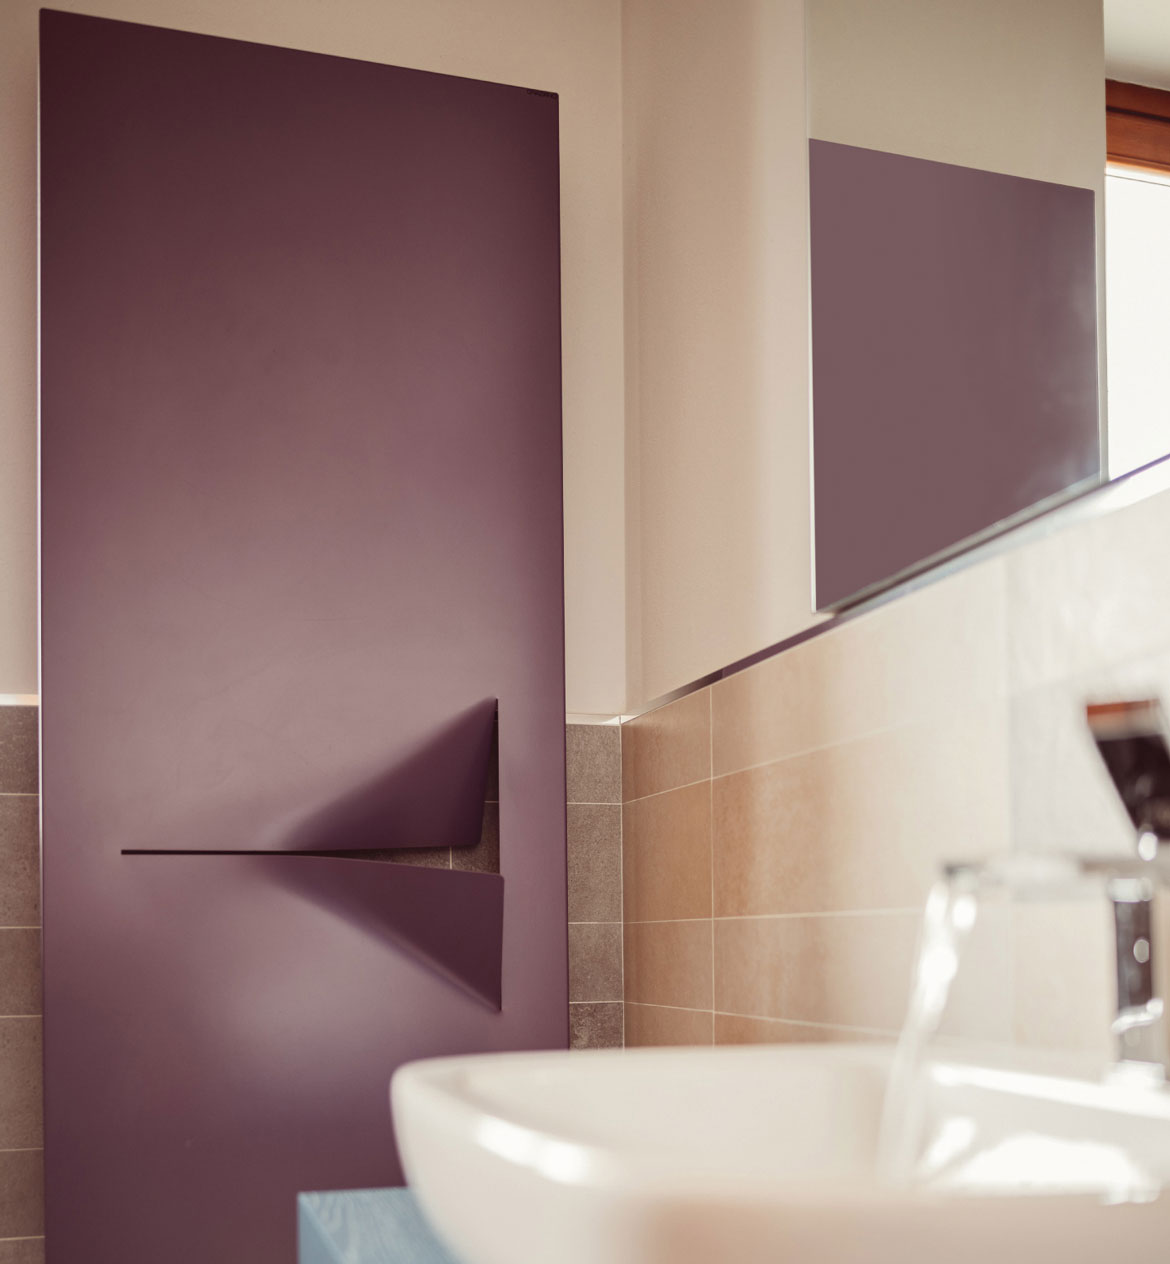 radiator-heated-towel-rail-to-plate-glamor-graziano